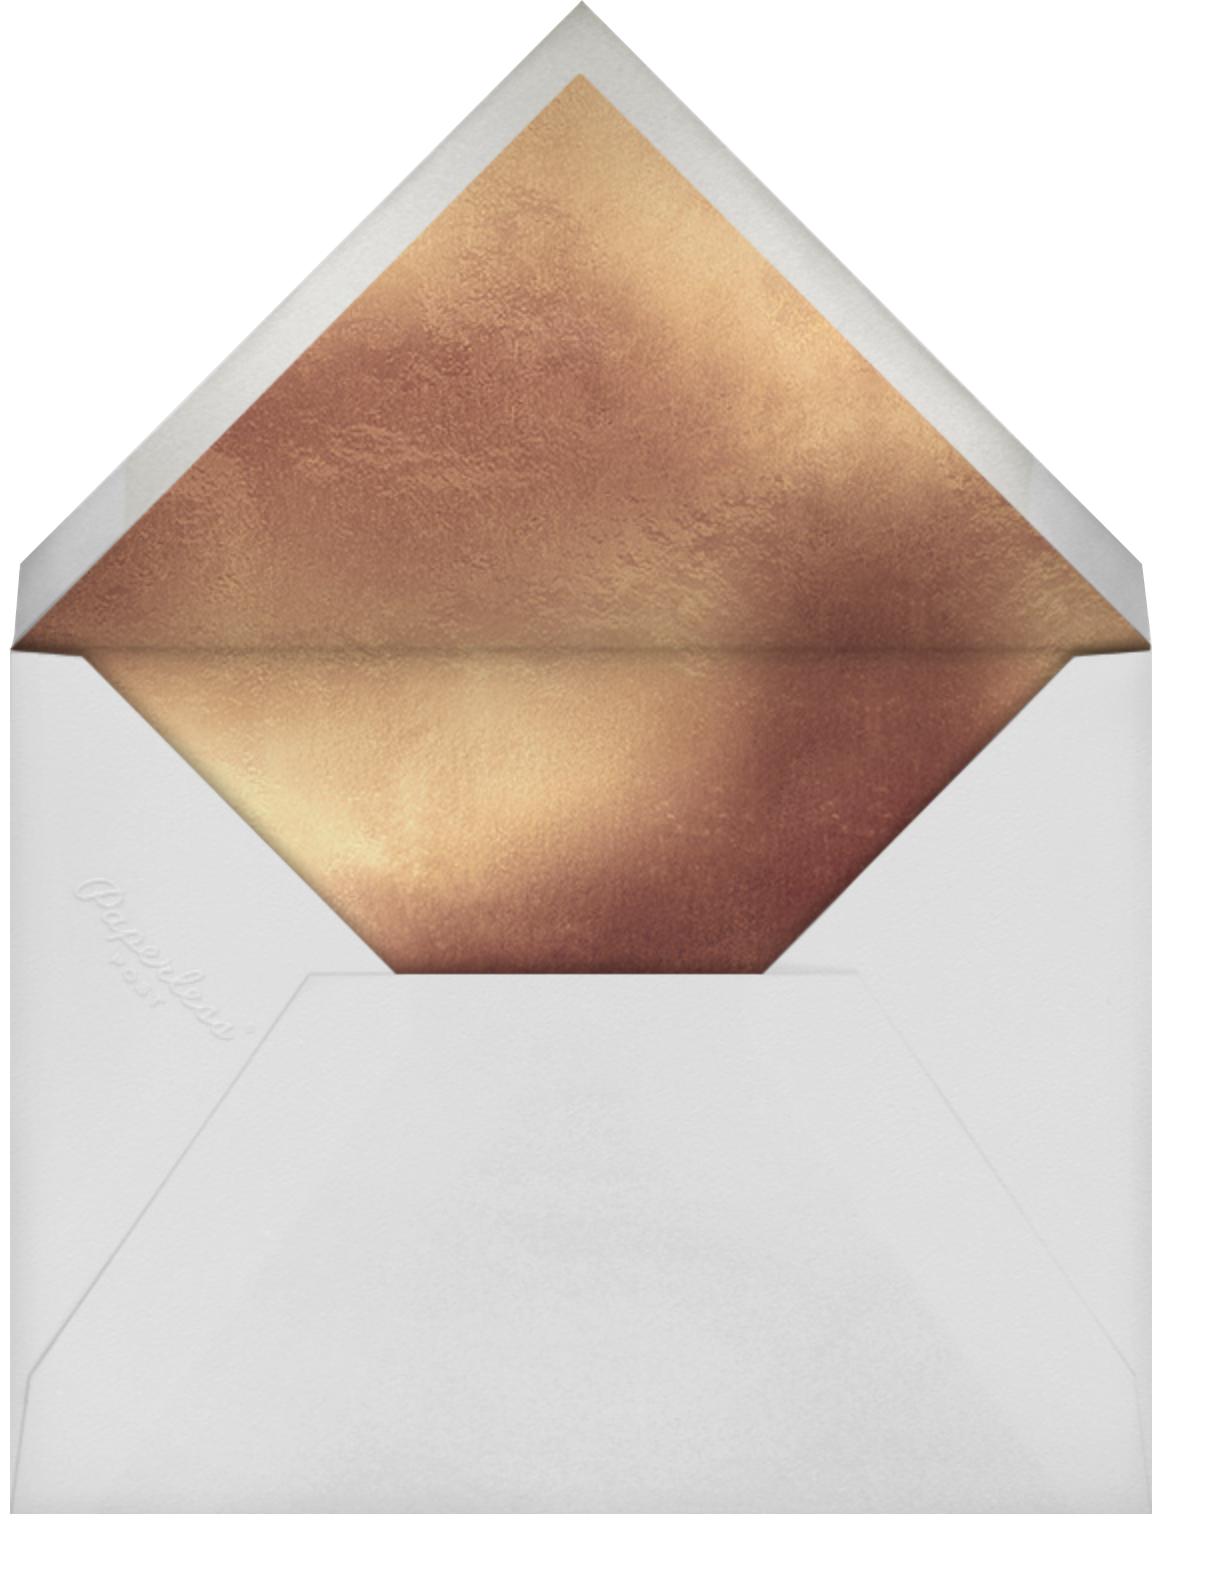 Embossed Daisies - Charcoal - kate spade new york - Birthday - envelope back